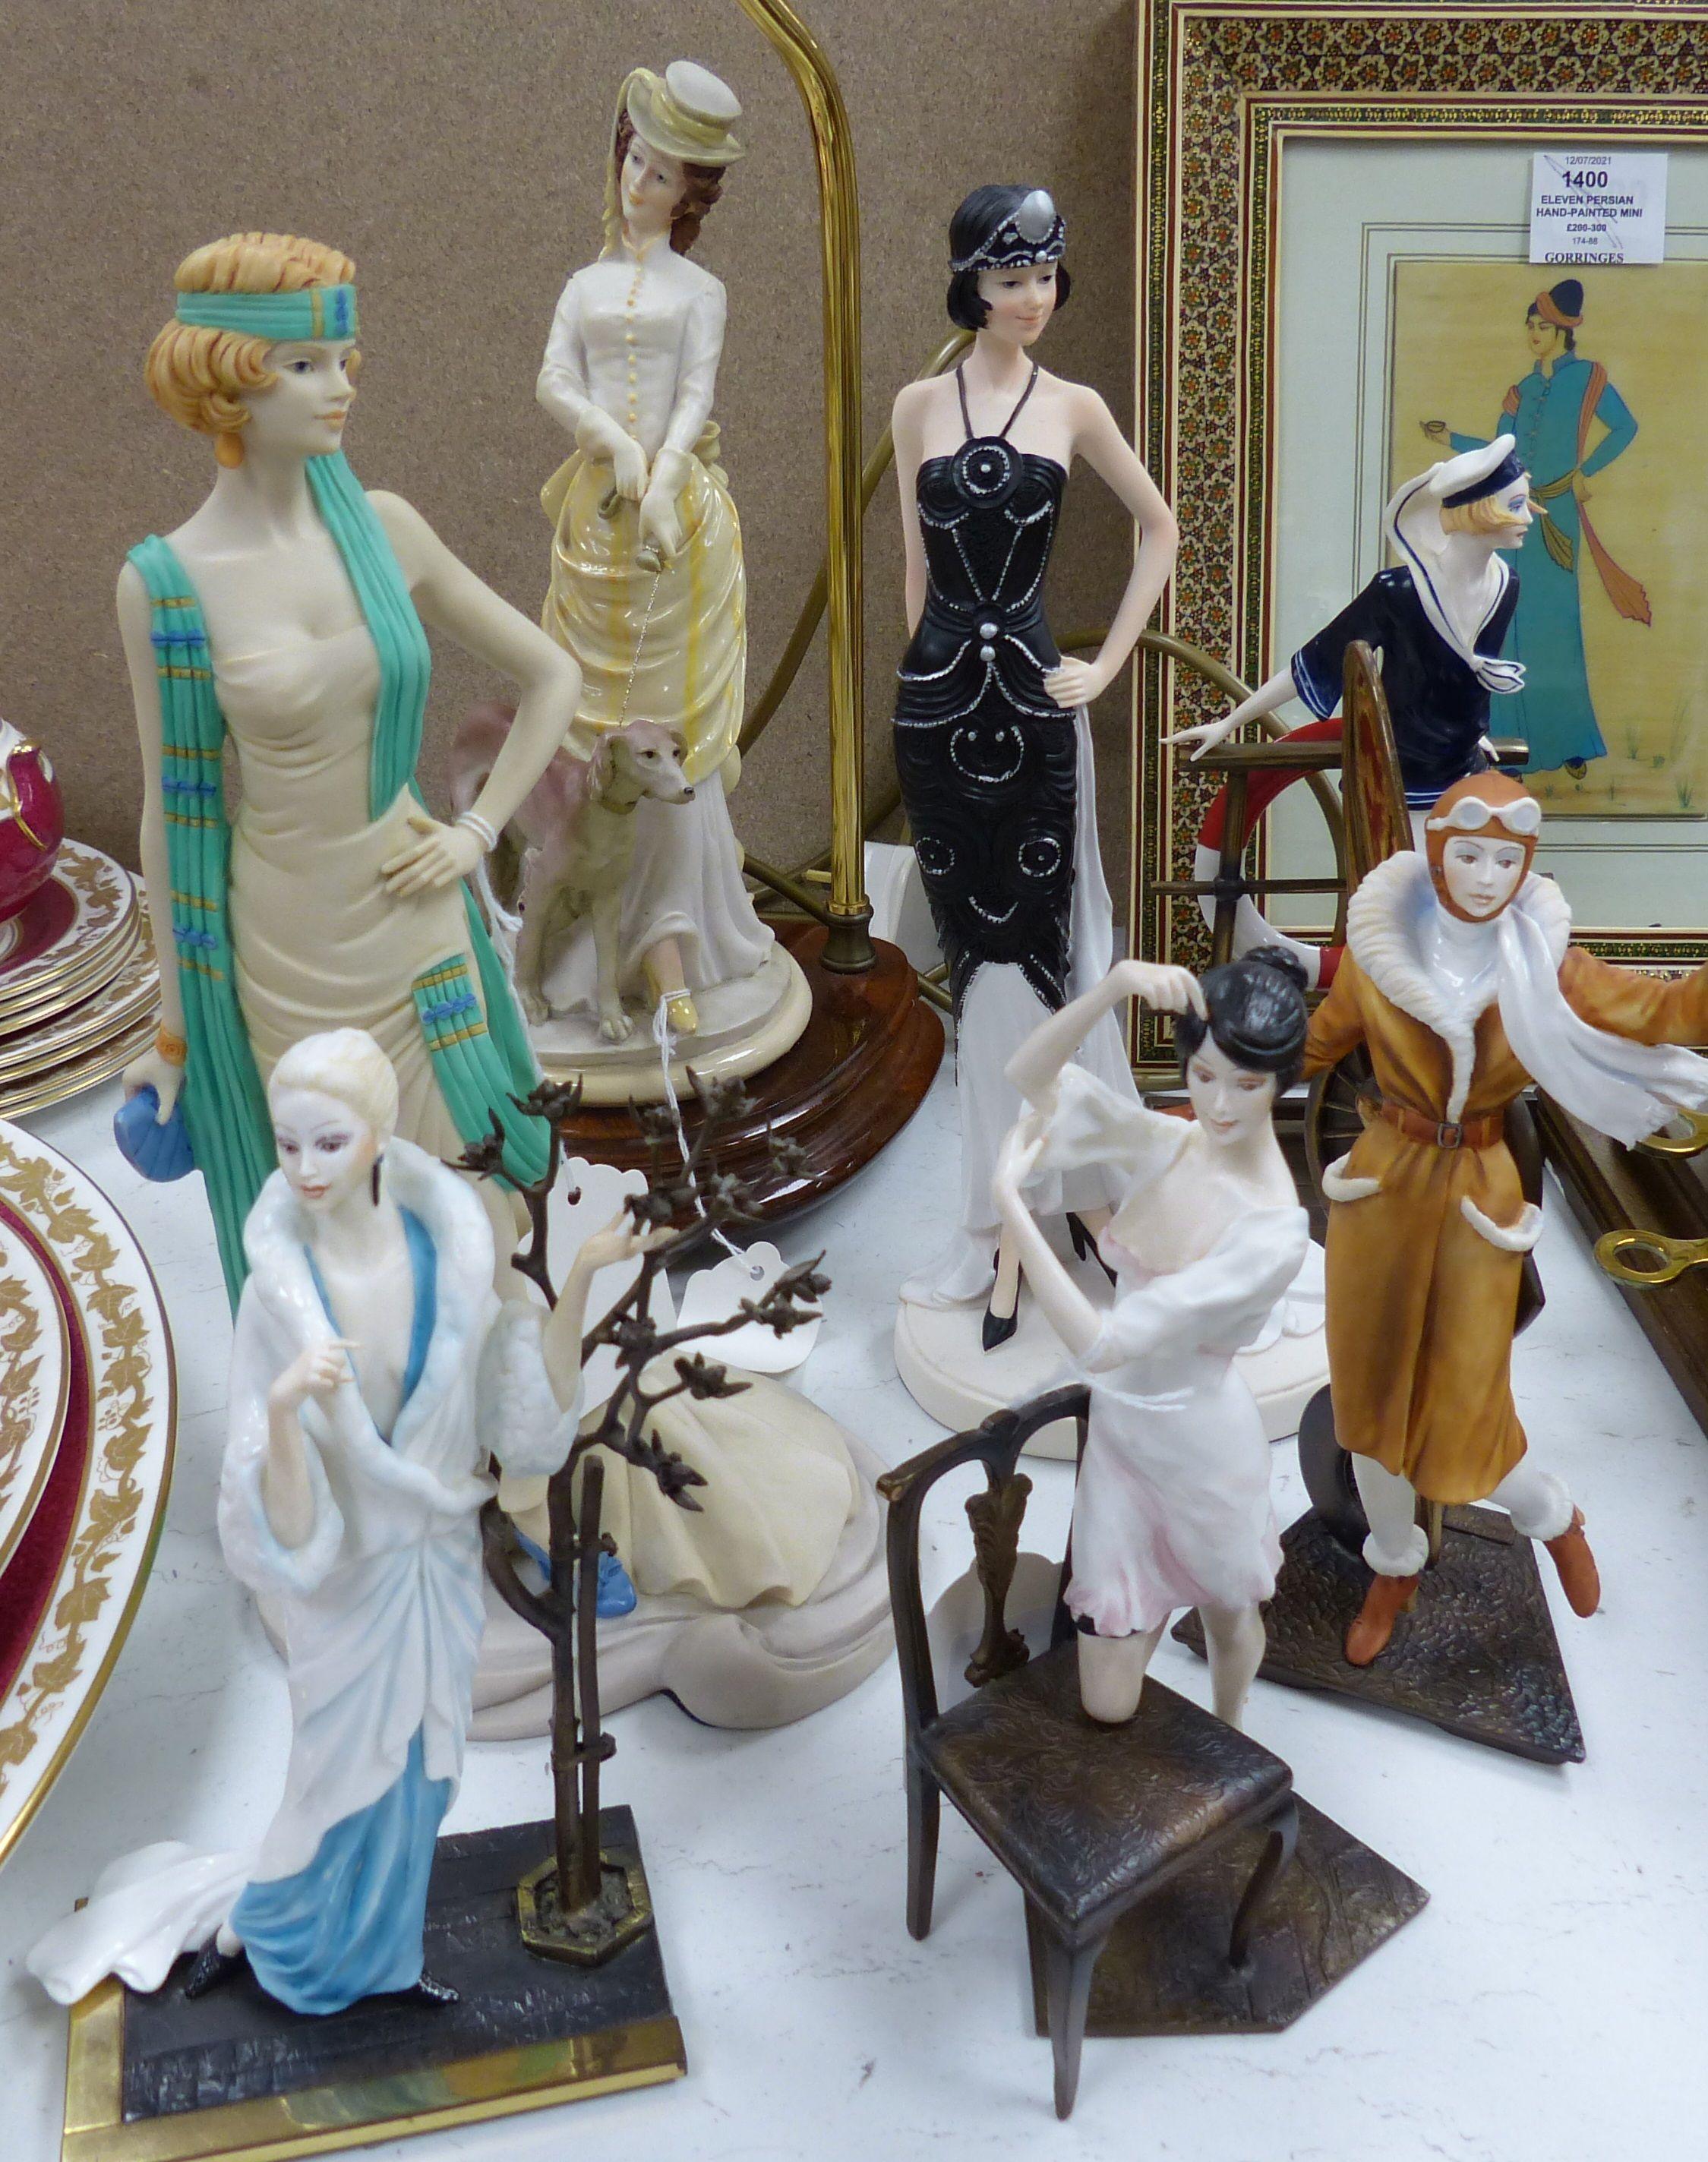 Four Albany bronzed metal and ceramic of elegant 1920's ladies, including 'Female Aviator', three